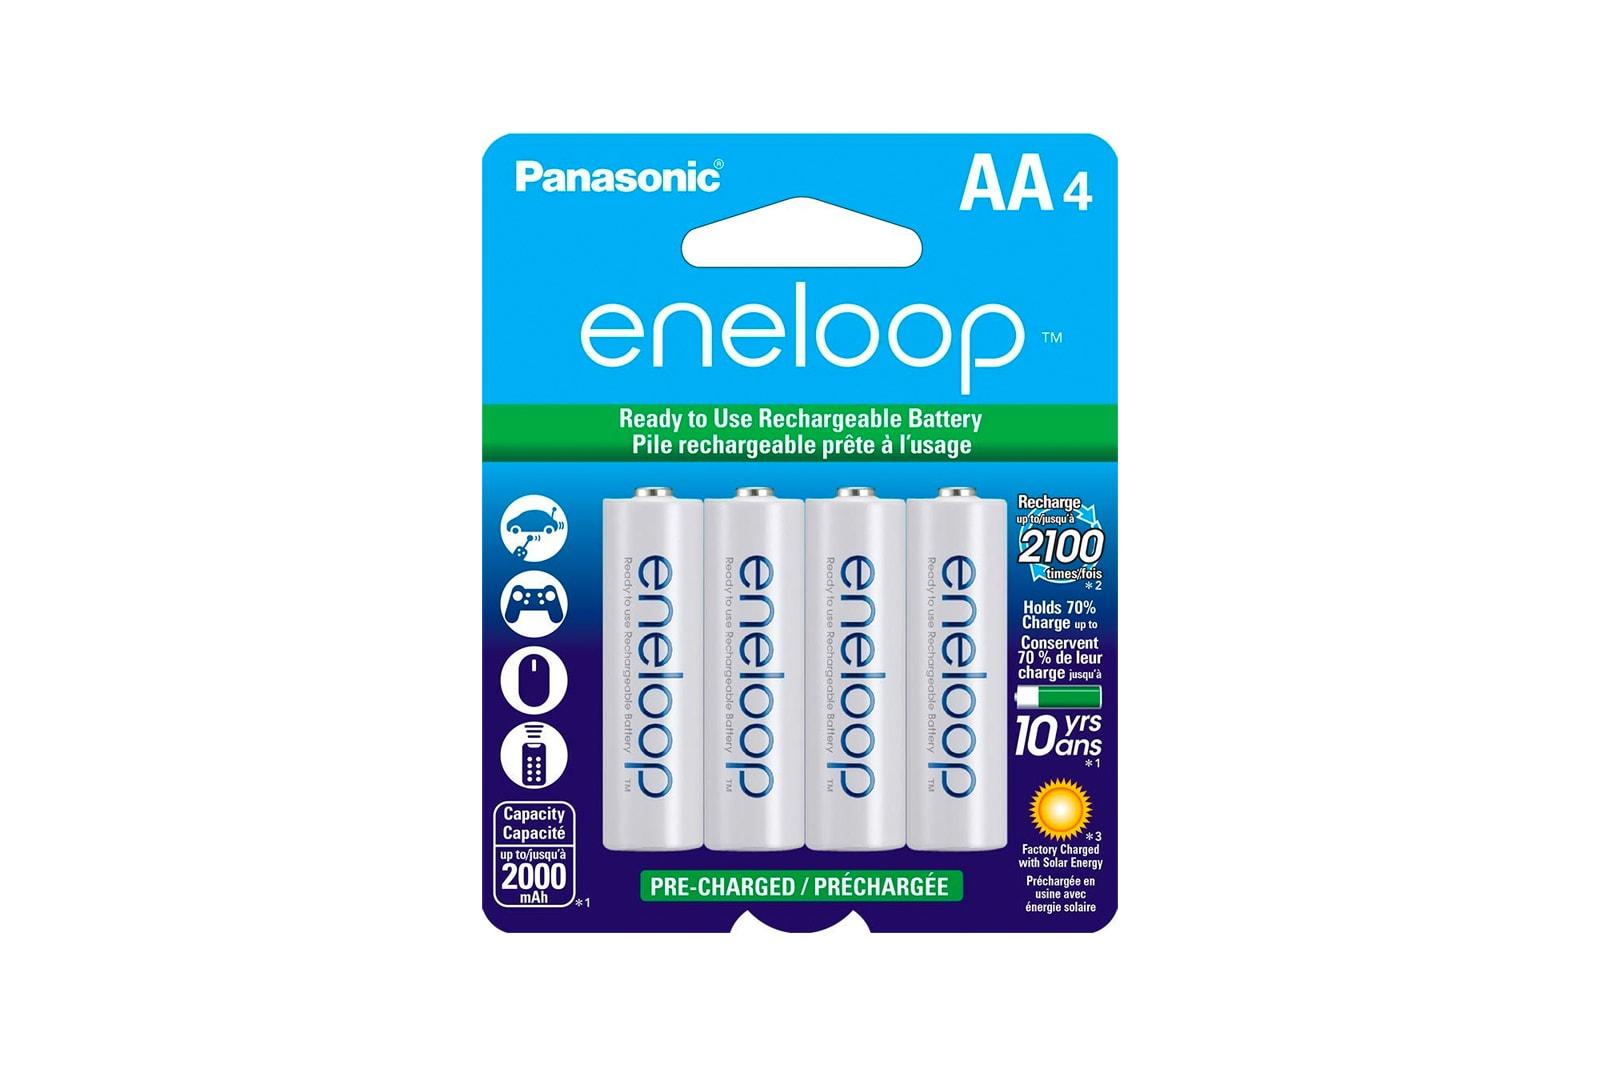 Panasonic Eneloop AA Rechargeable Batteries 4-Pack